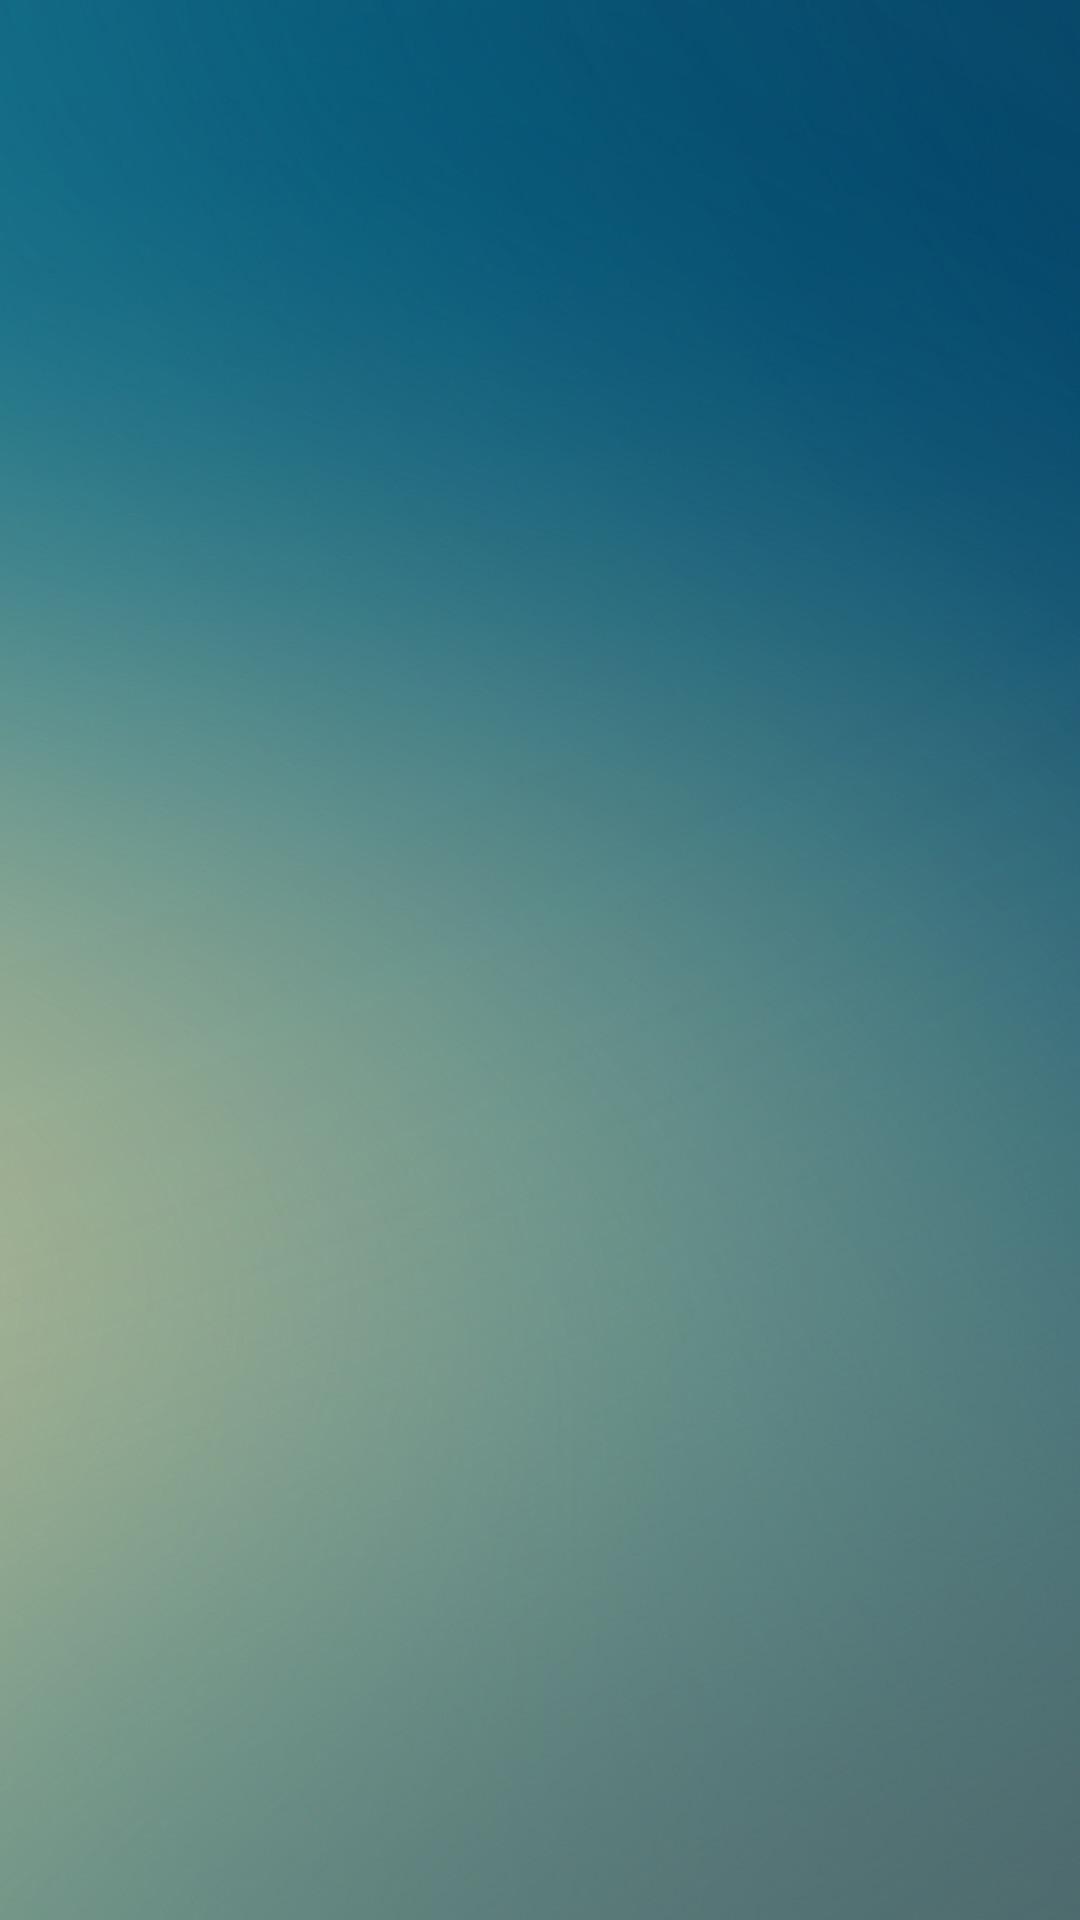 … Blue Yellow Wallpaper iphone 6S Plus by DeviantSith17